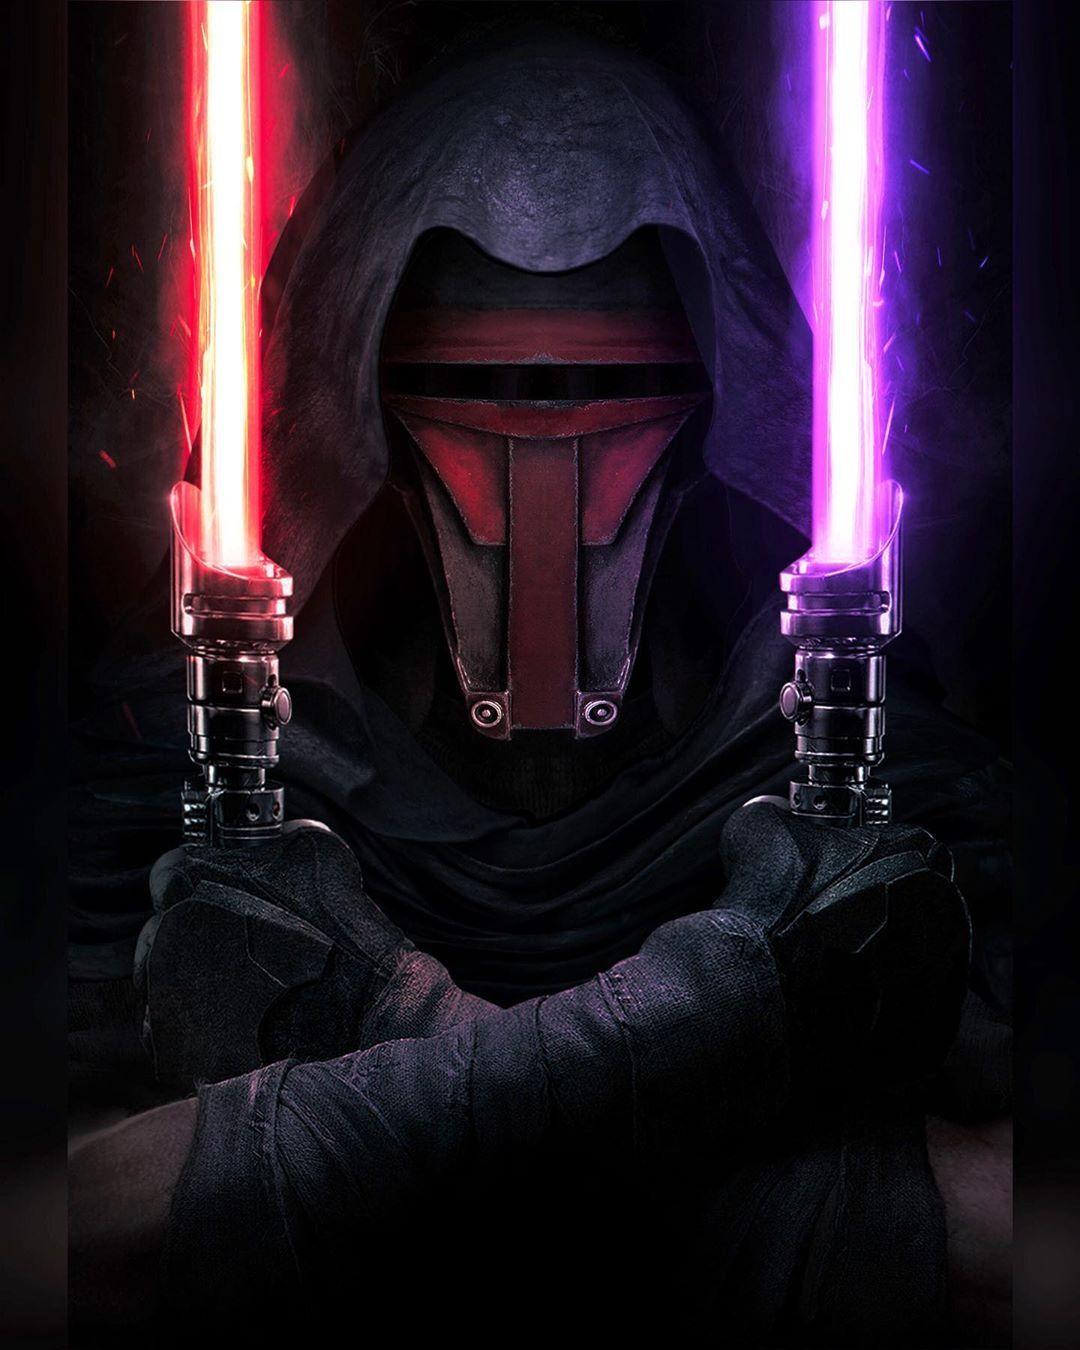 Star Wars The Rise Of Skywalker Star Wars Images Star Wars Wallpaper Star Wars Darth Revan